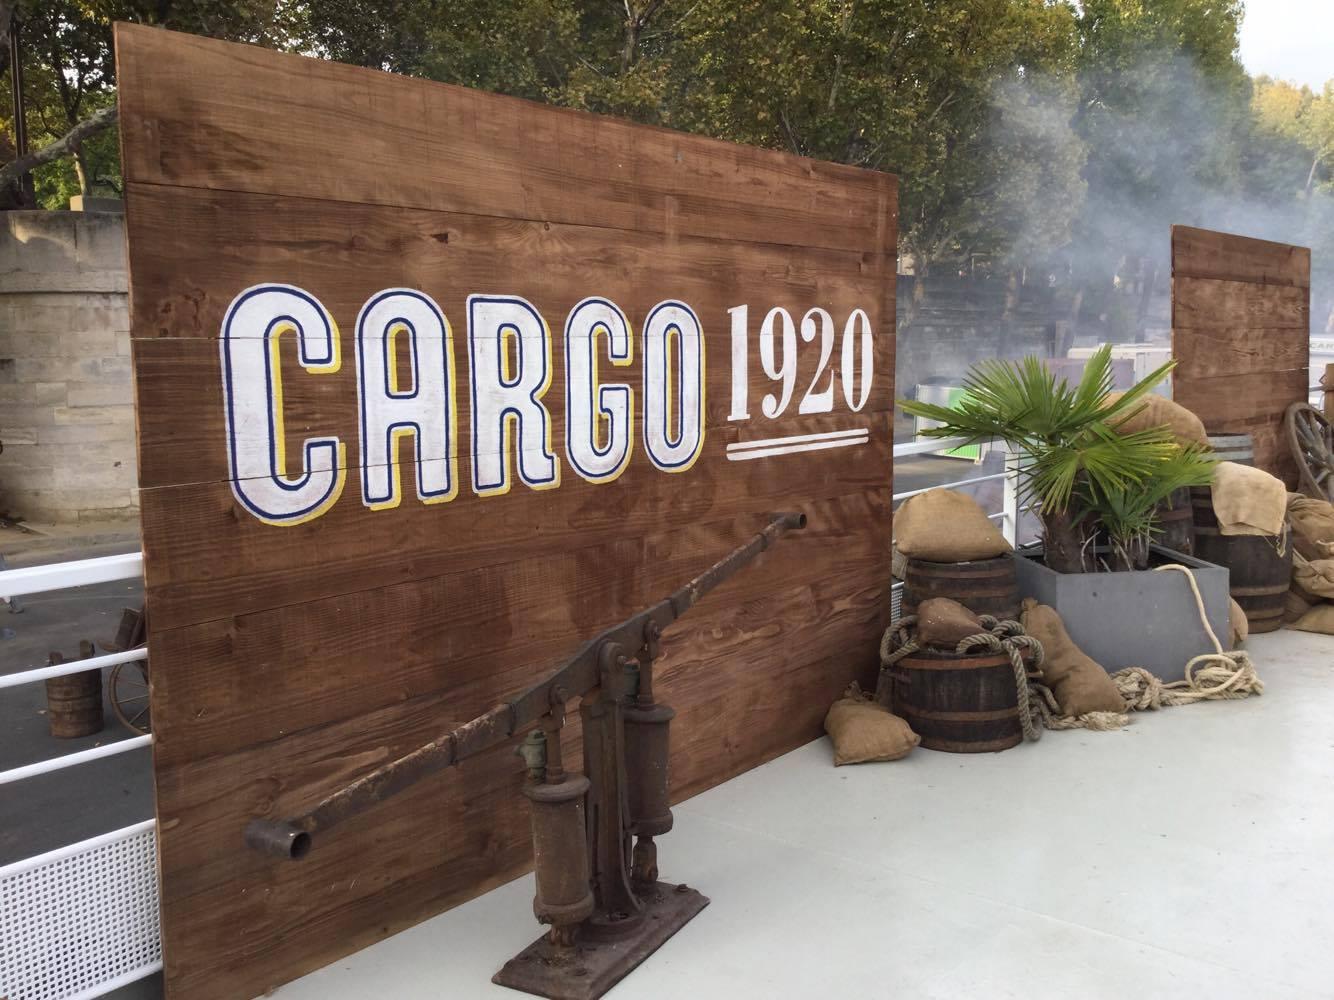 Décor J&B Cargo Studio Trigone